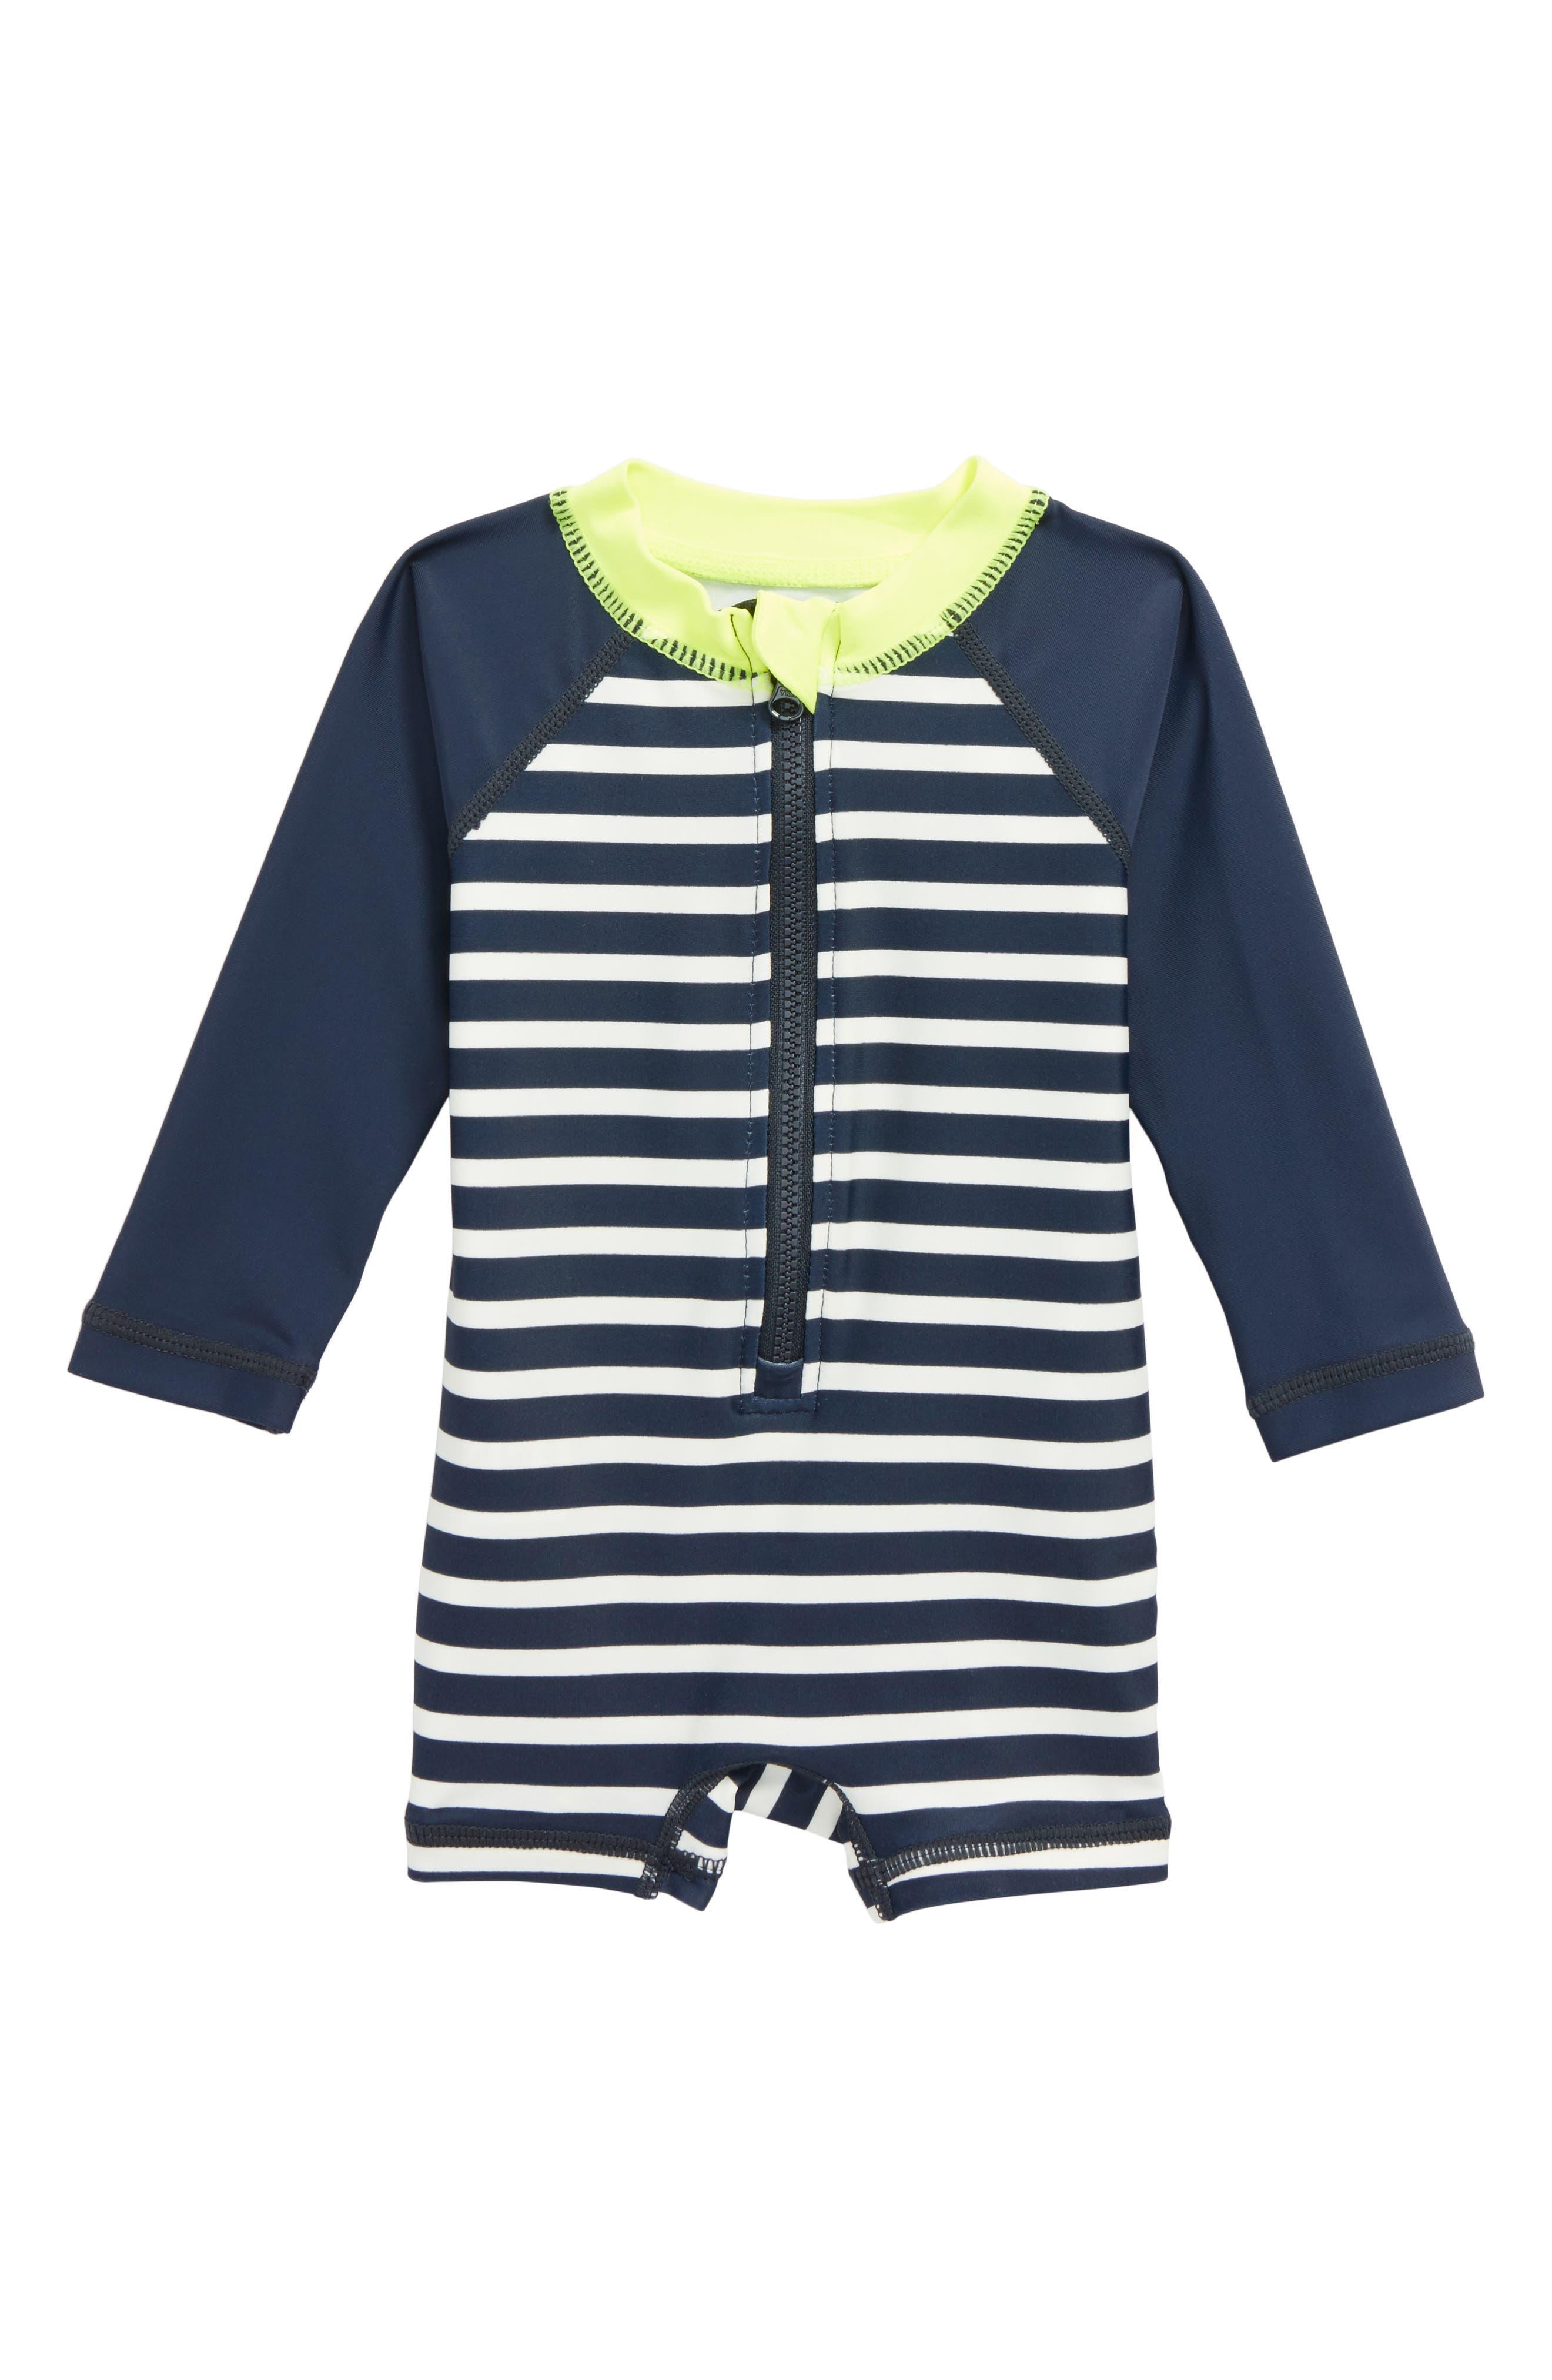 Tea Collection Stripe One-Piece Rashguard Swimsuit (Baby Boys)